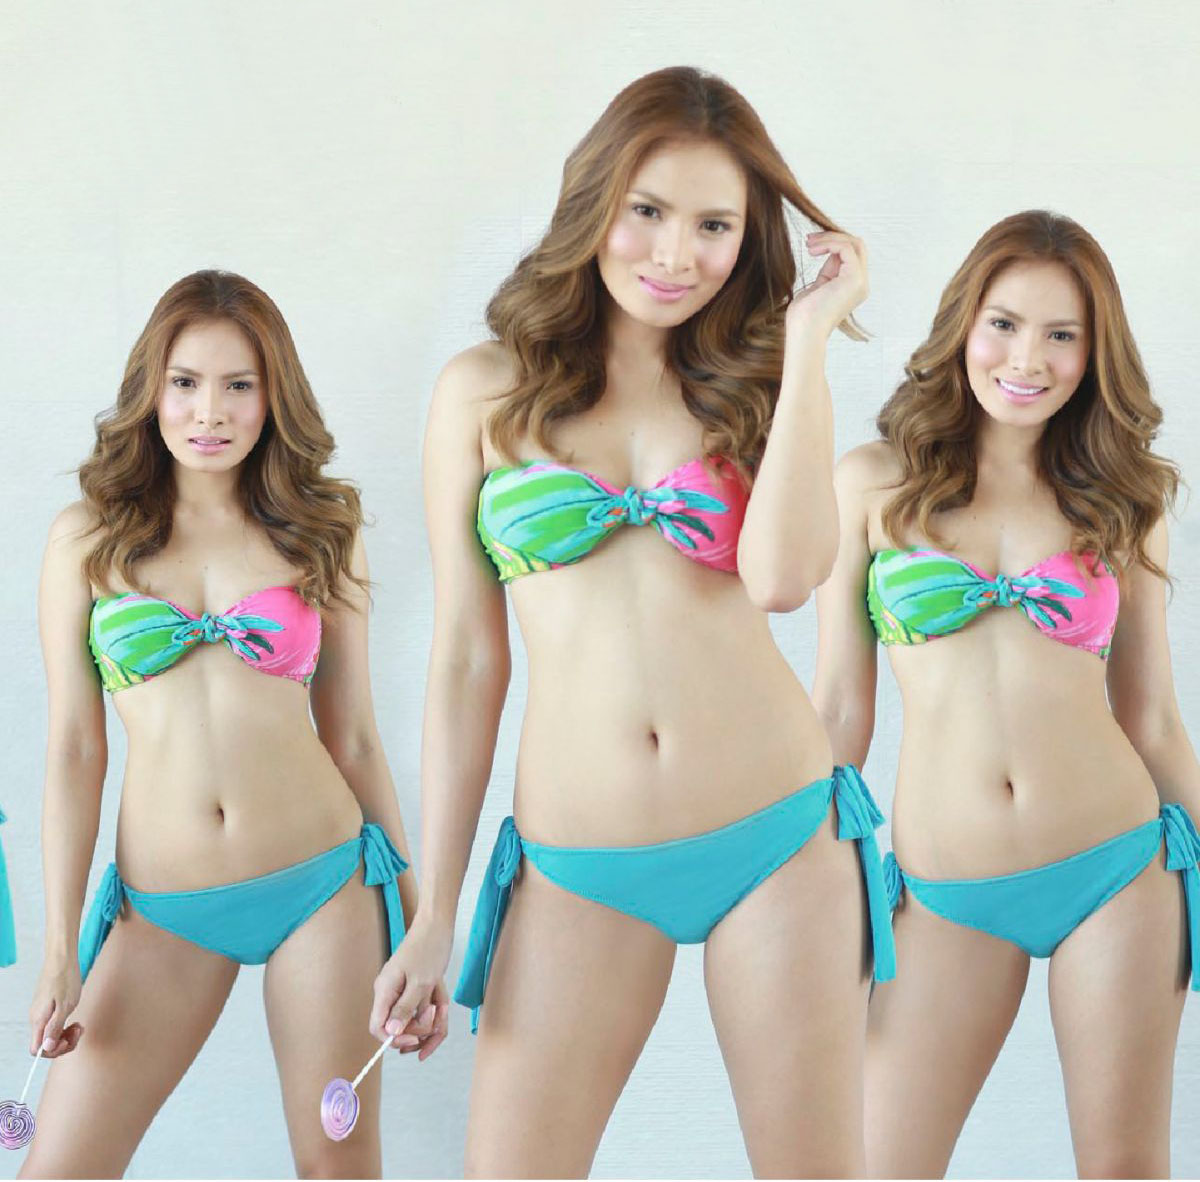 arny ross hot bikini photo